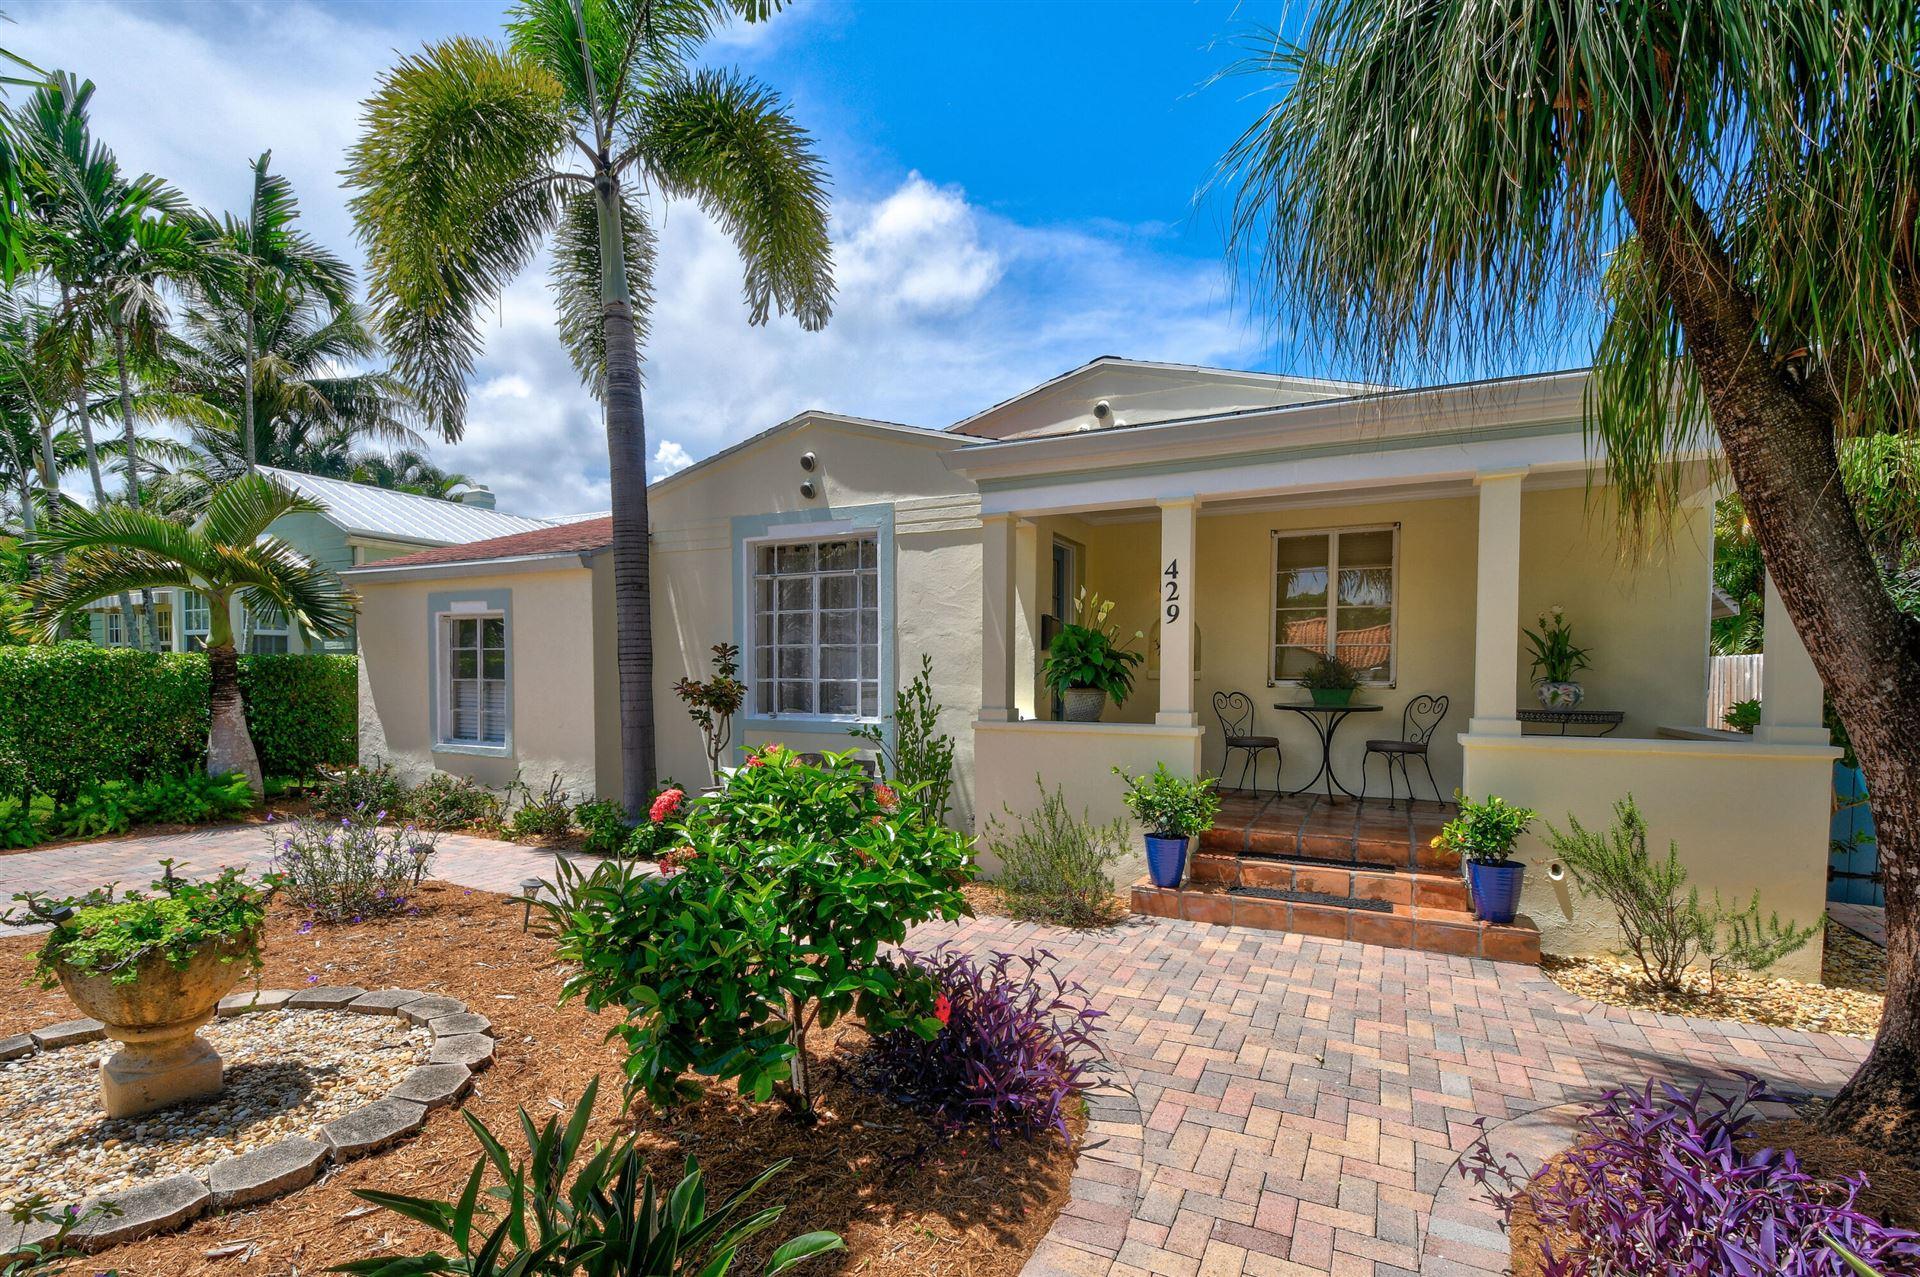 429 28th Street, West Palm Beach, FL 33407 - MLS#: RX-10731967